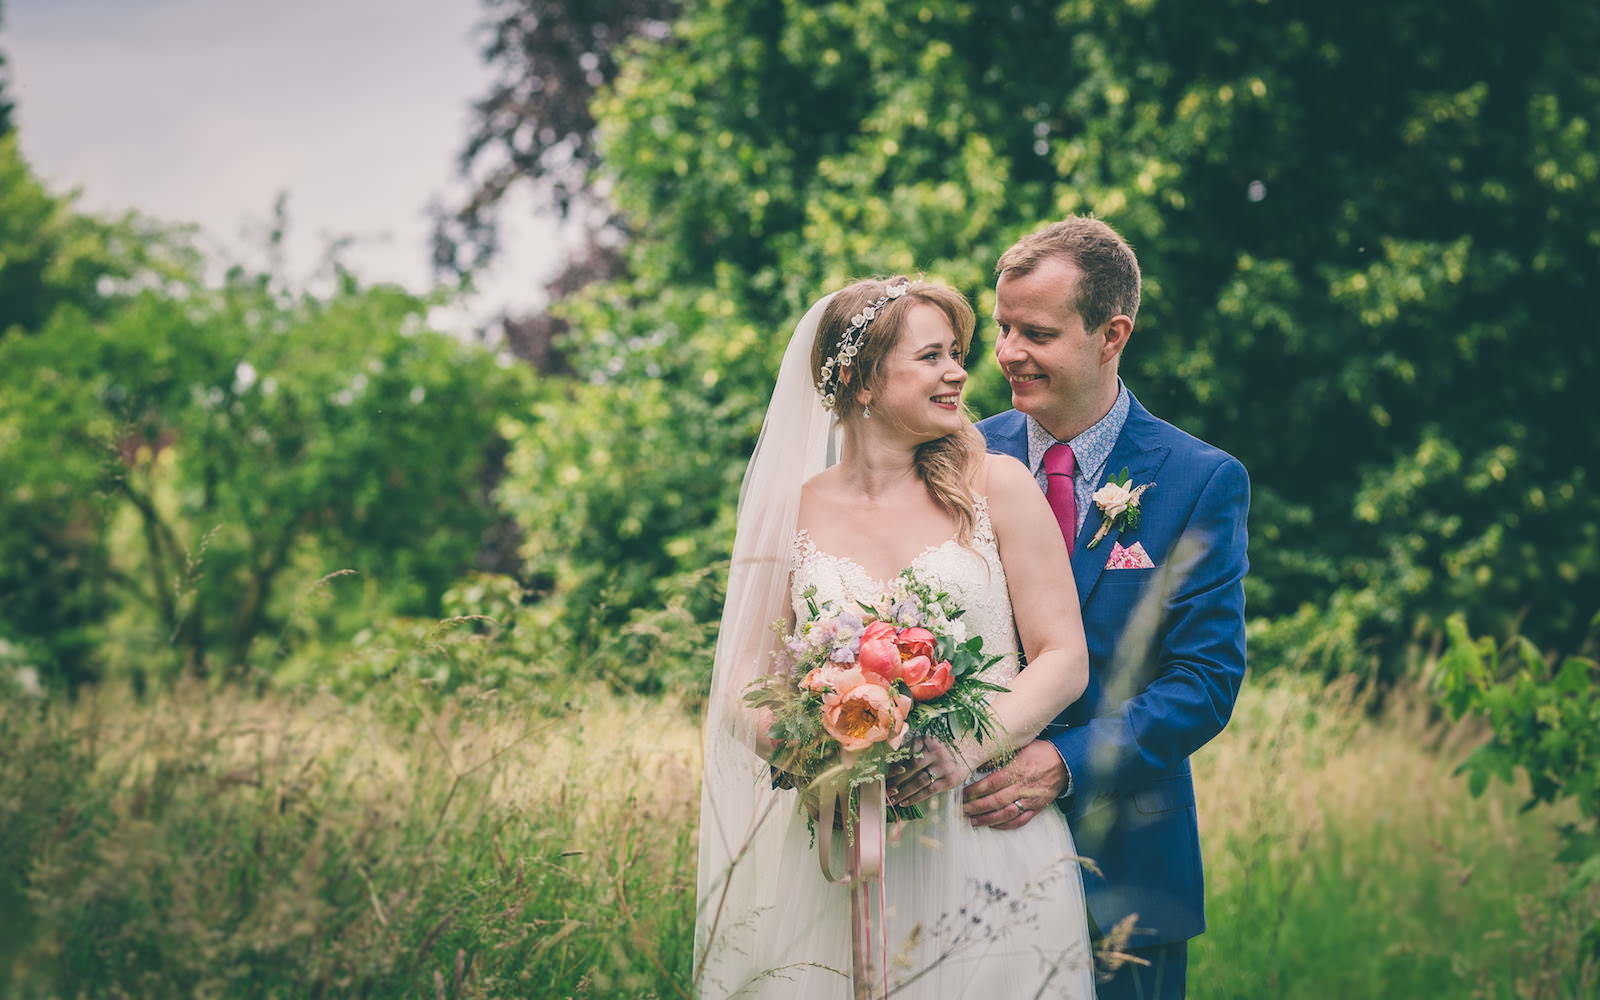 Elmore Court 2017 Wedding – Becky & Andrew